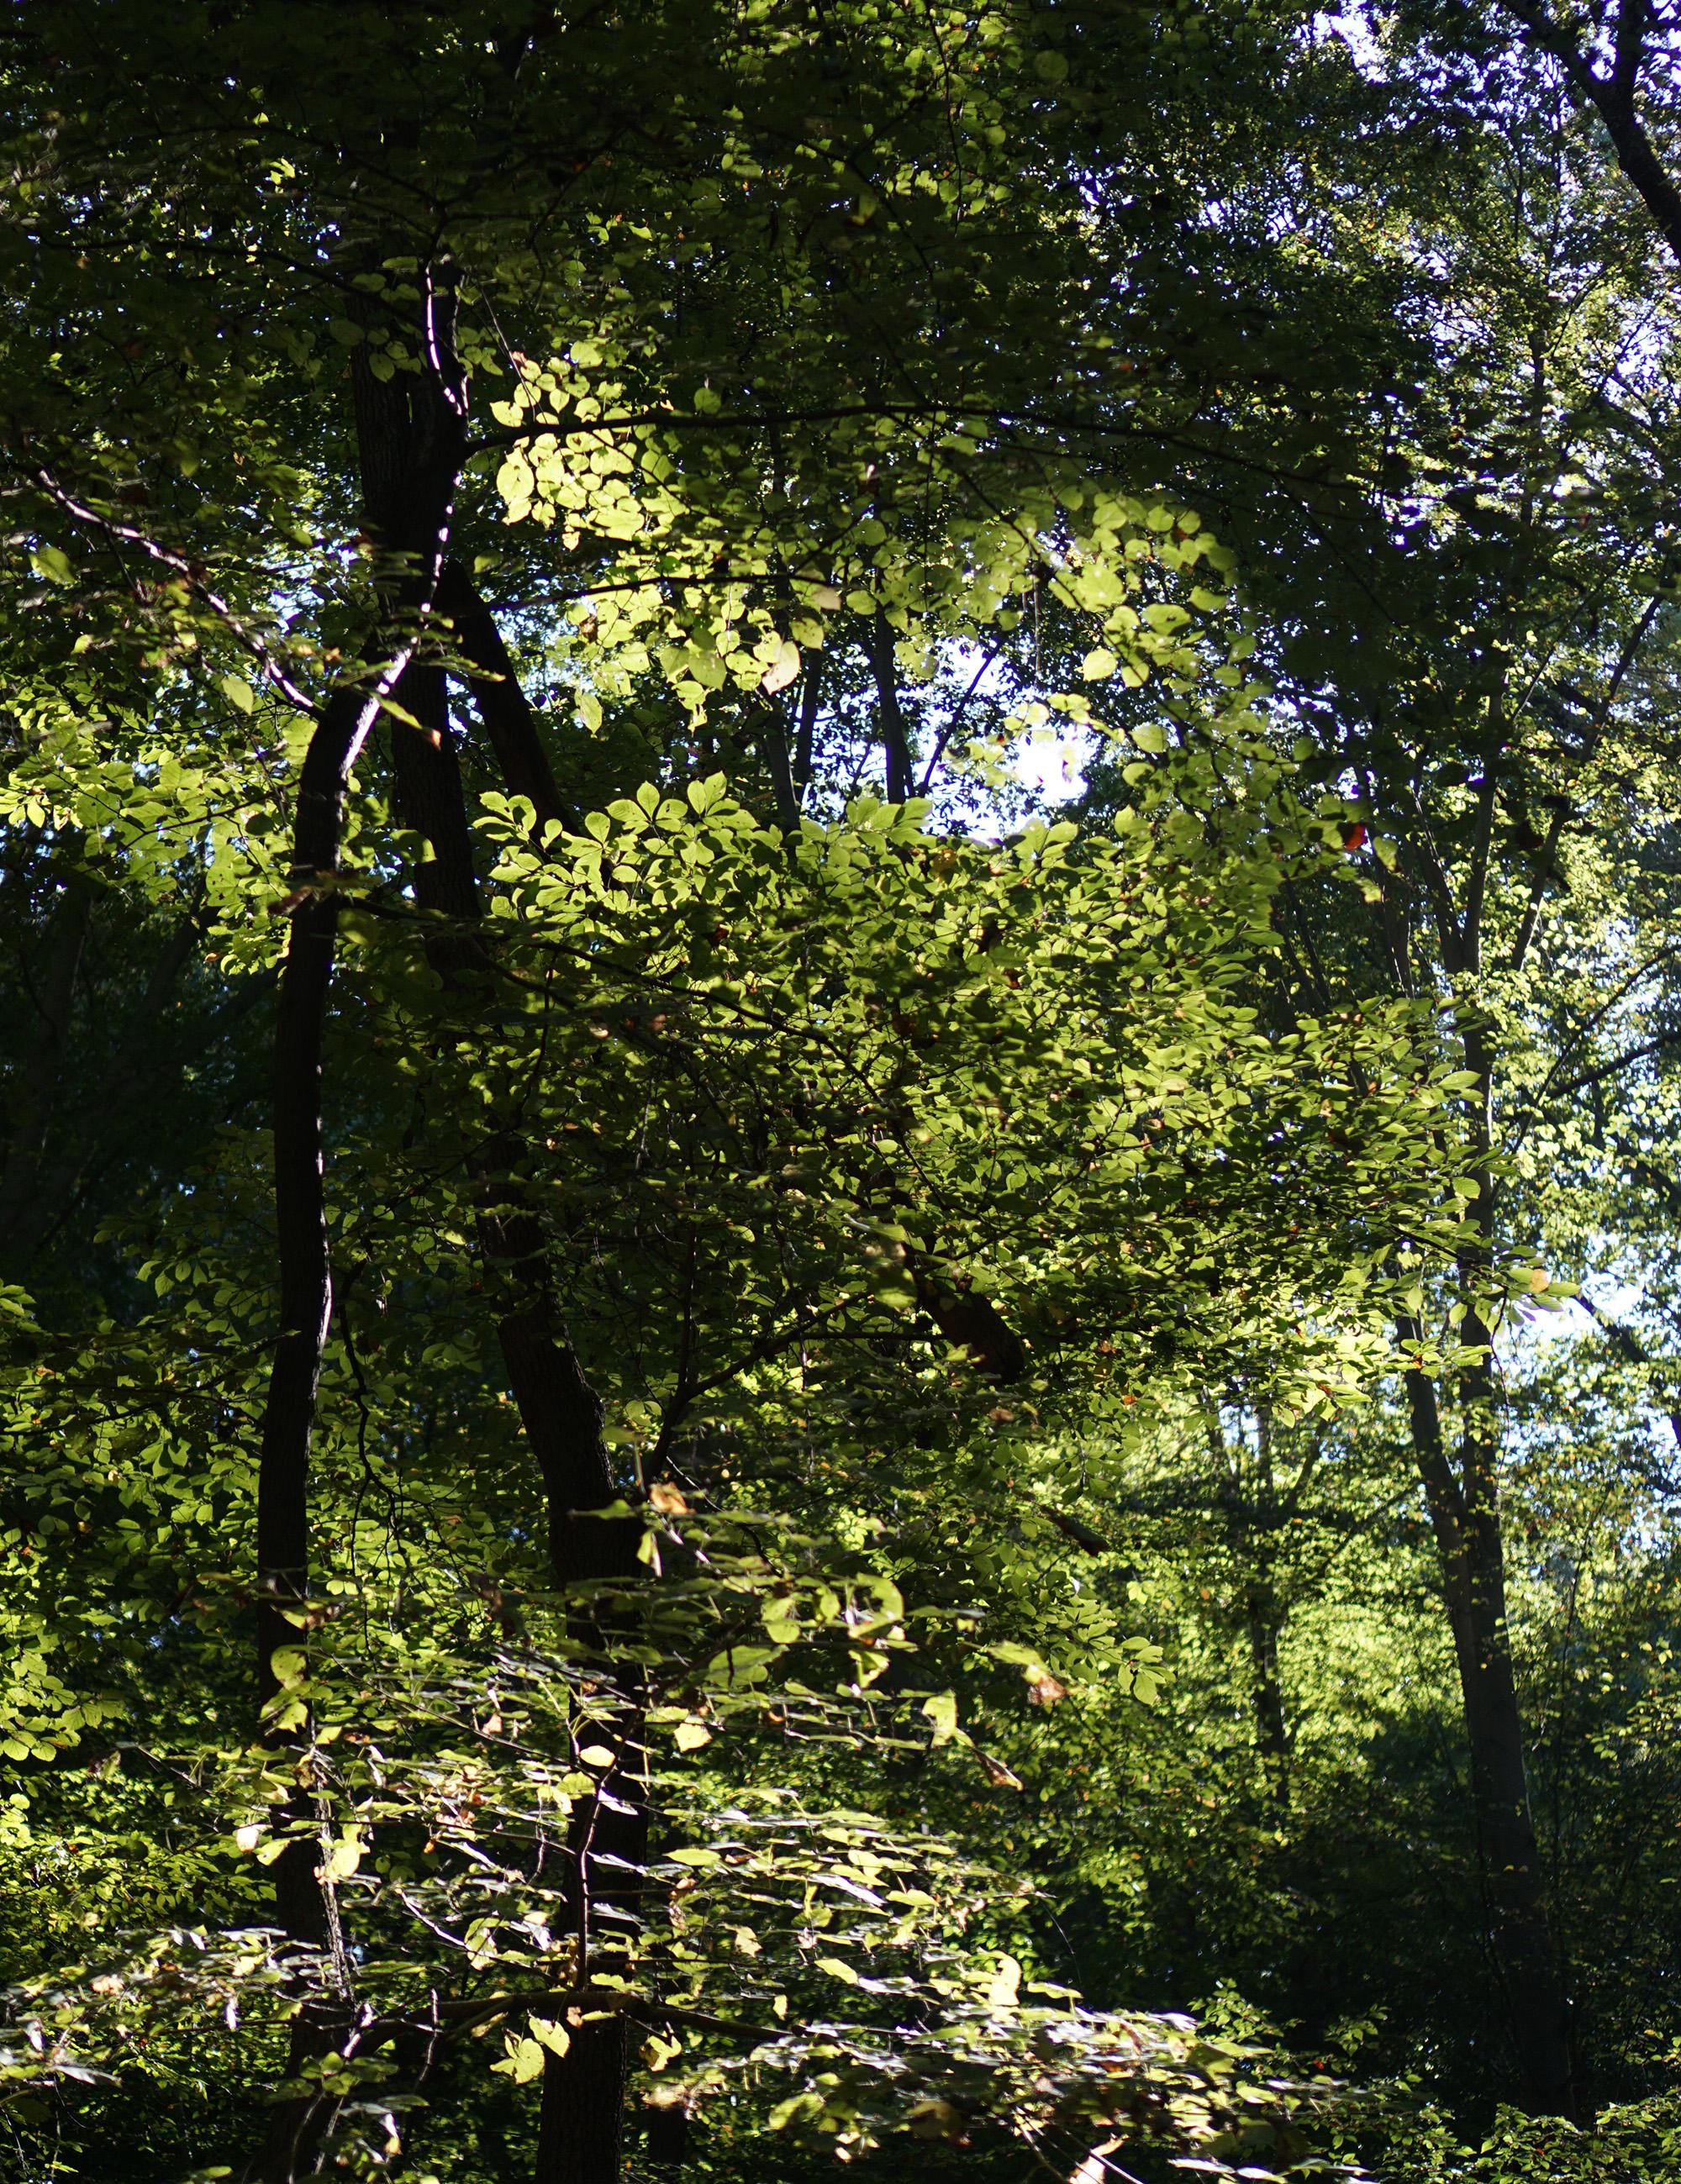 Sunlight through the branches, Patapsco Valley State Park, Maryland / Darker than Green